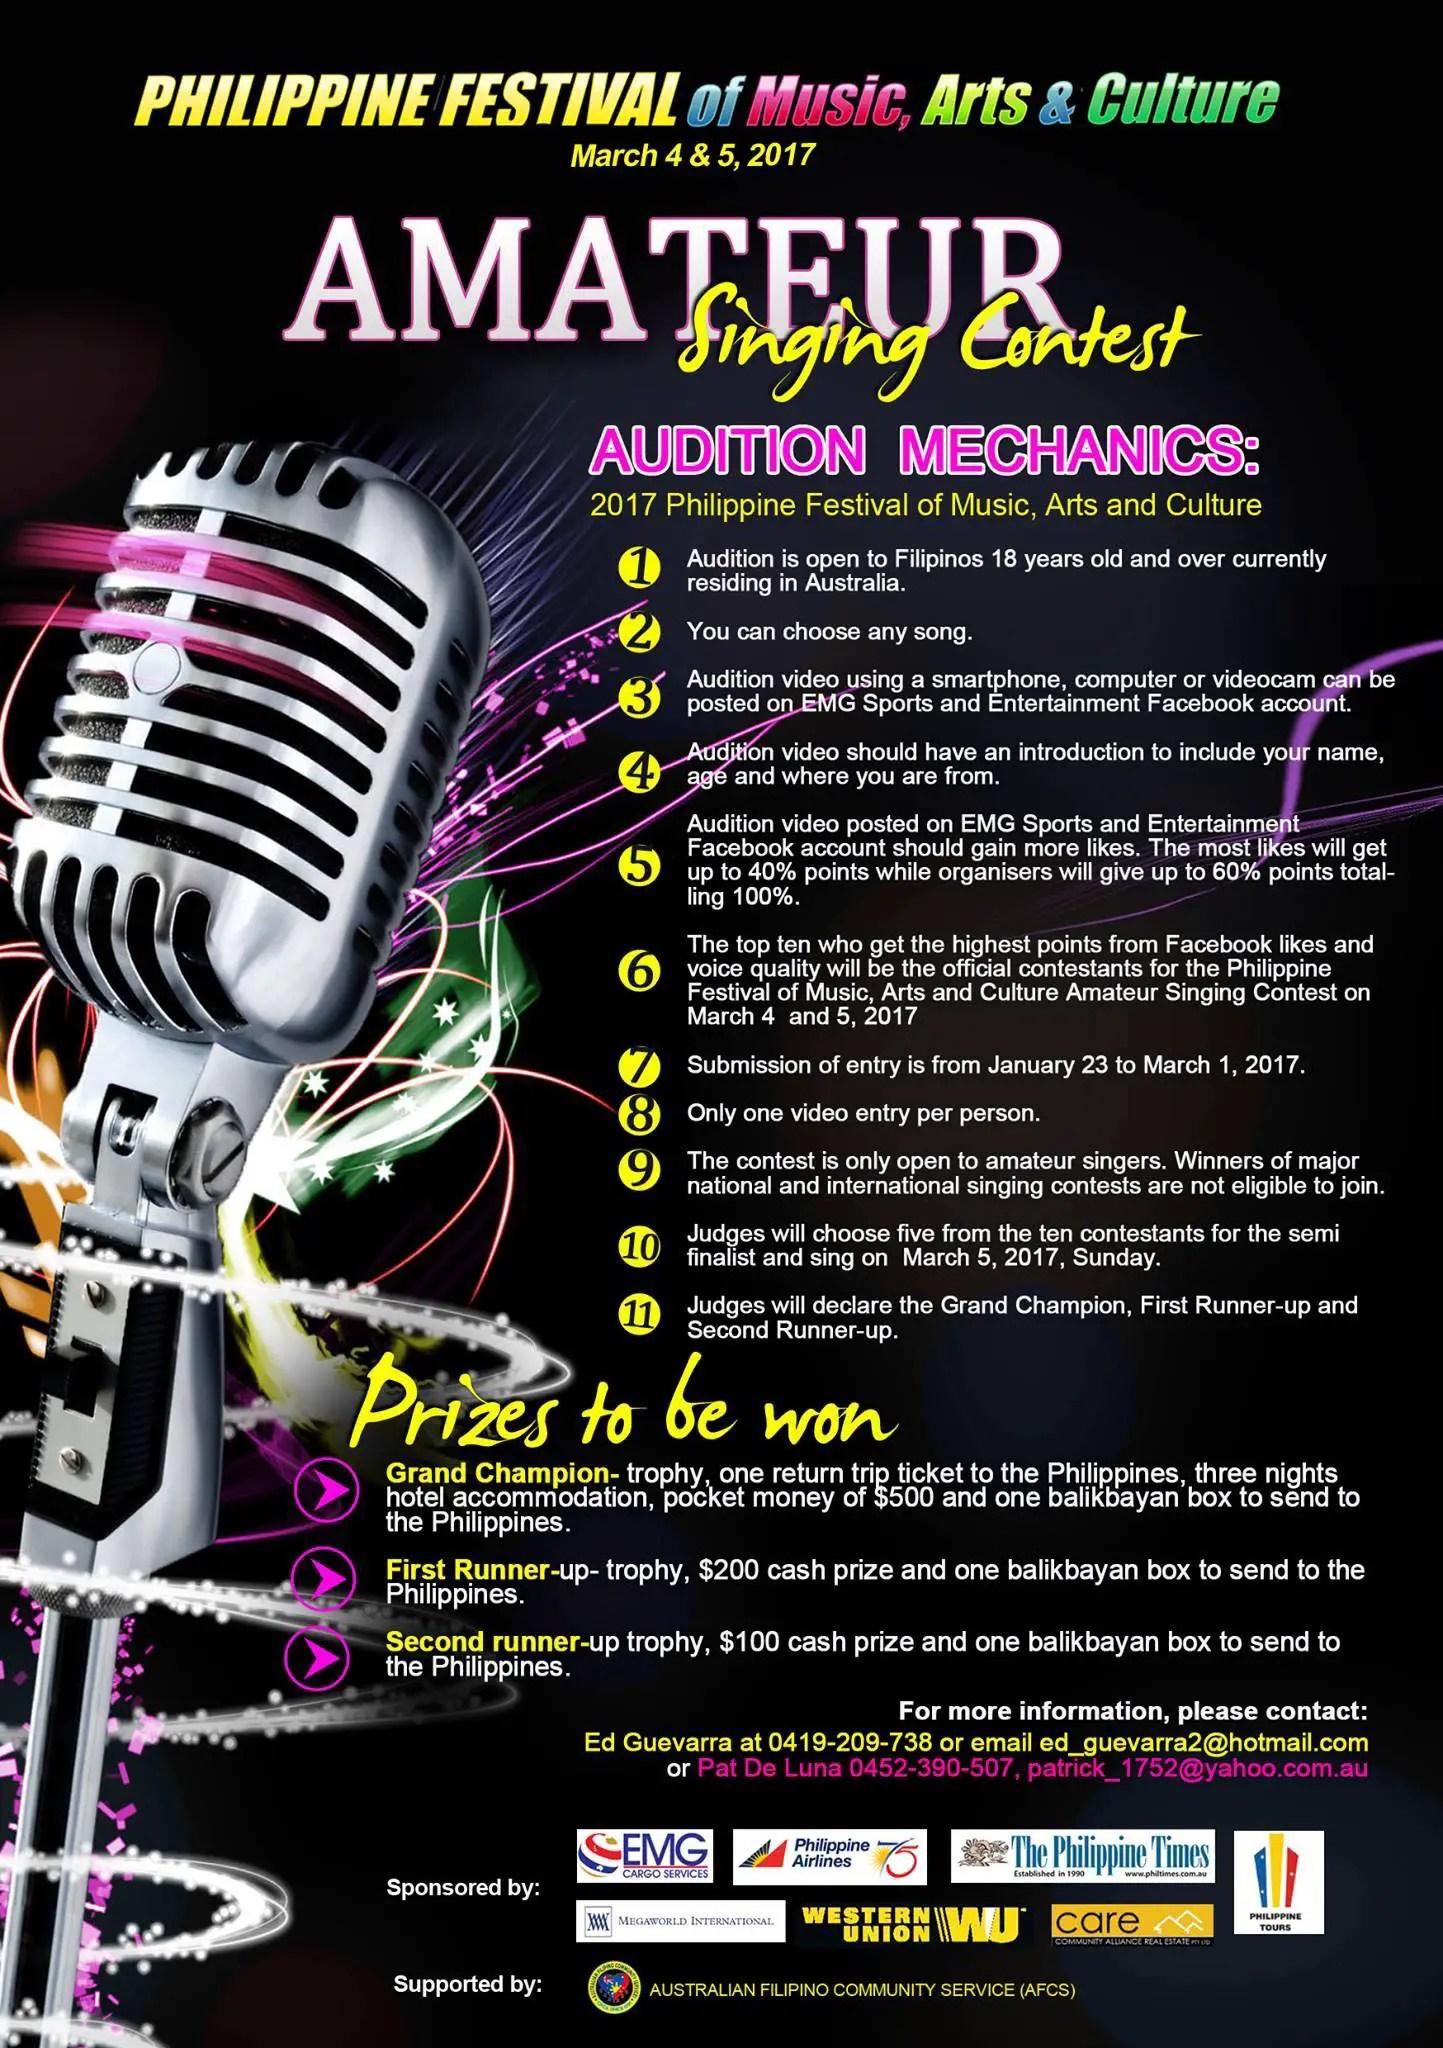 Music video contest cash prizes